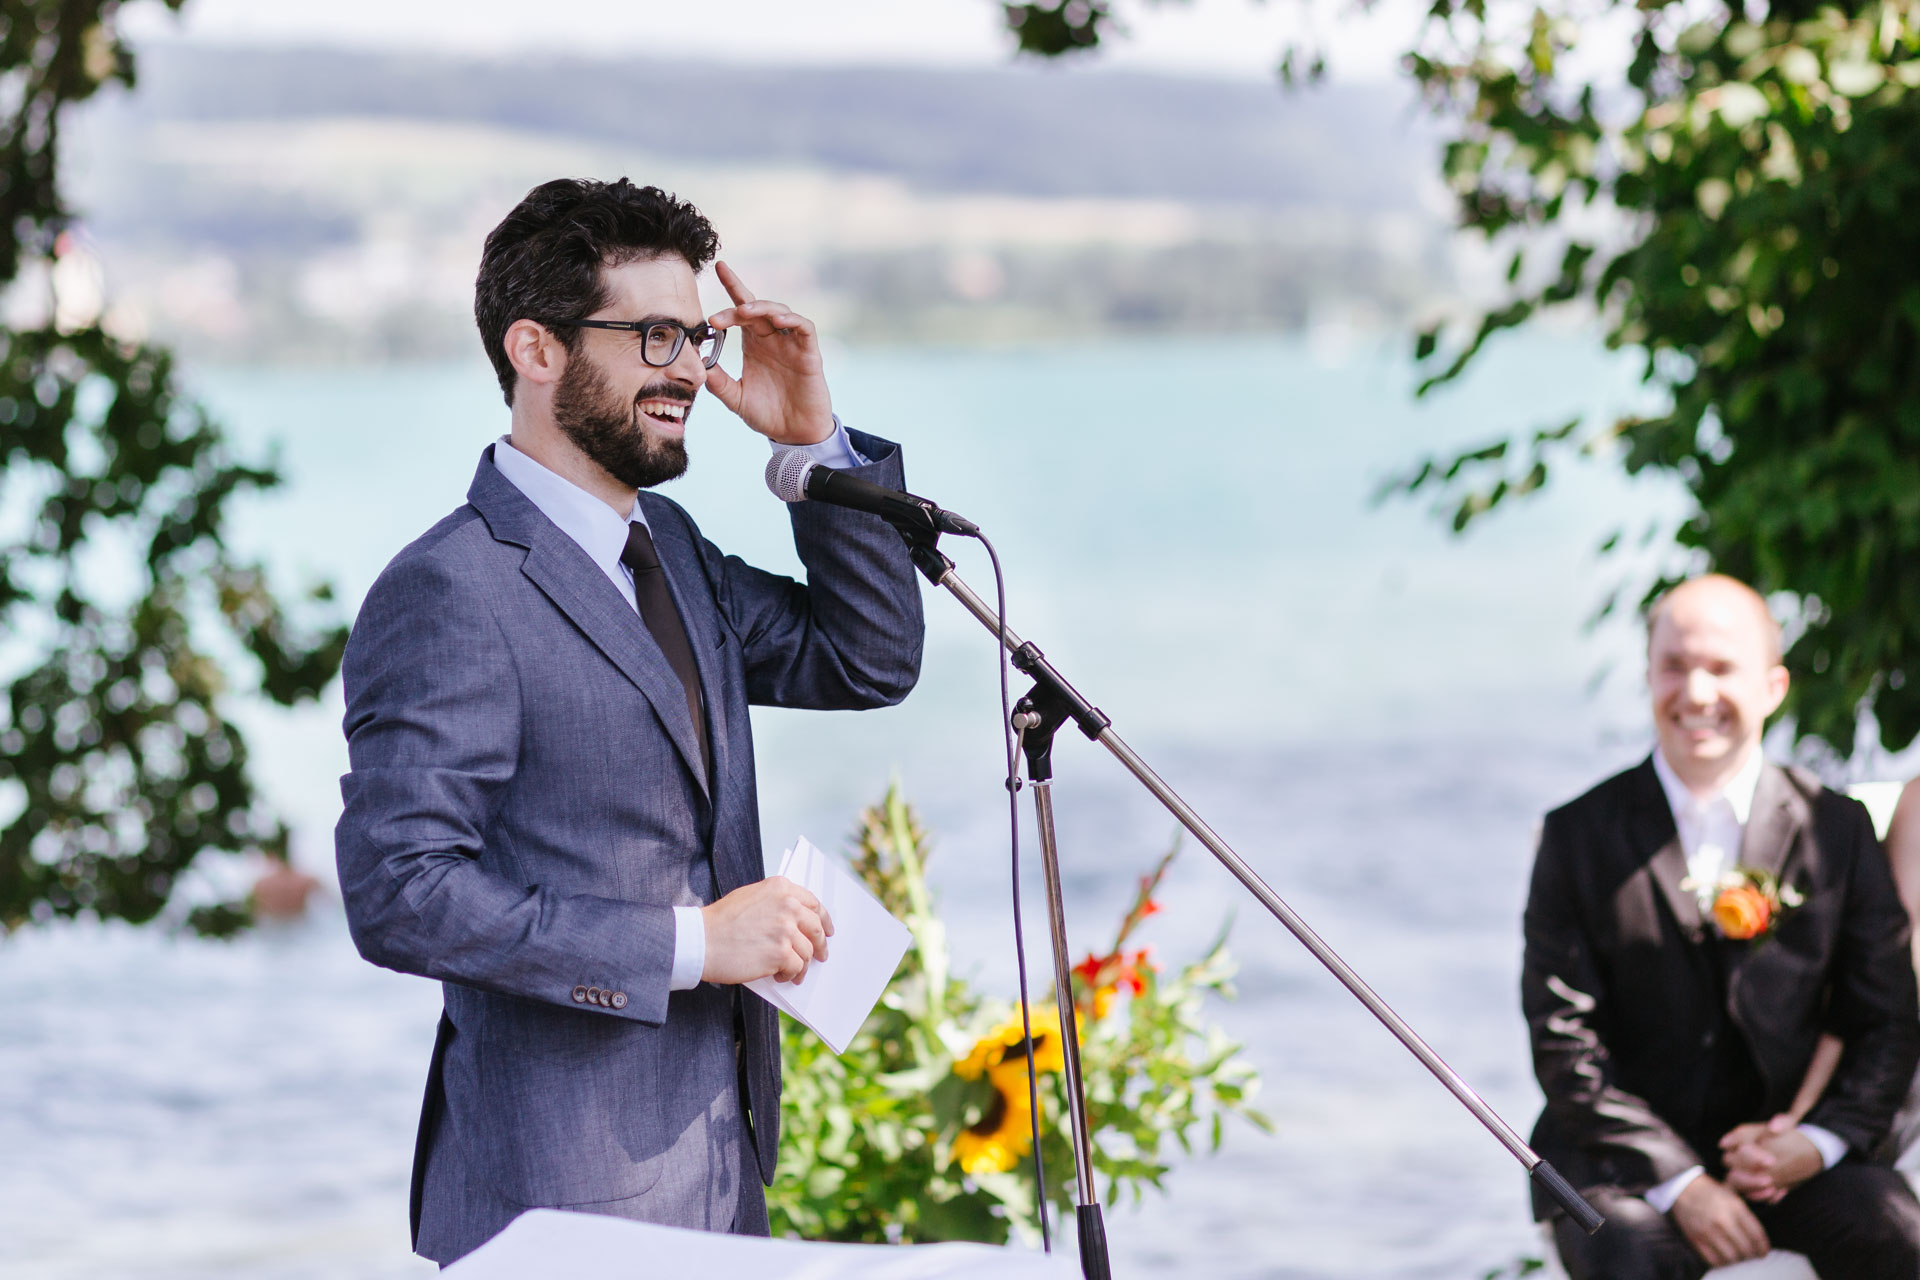 Pixelart_Hochzeitsfotografen_Loerrach_Rheinfelden_Hallwil_Schweiz_Linda-Ramon-1025